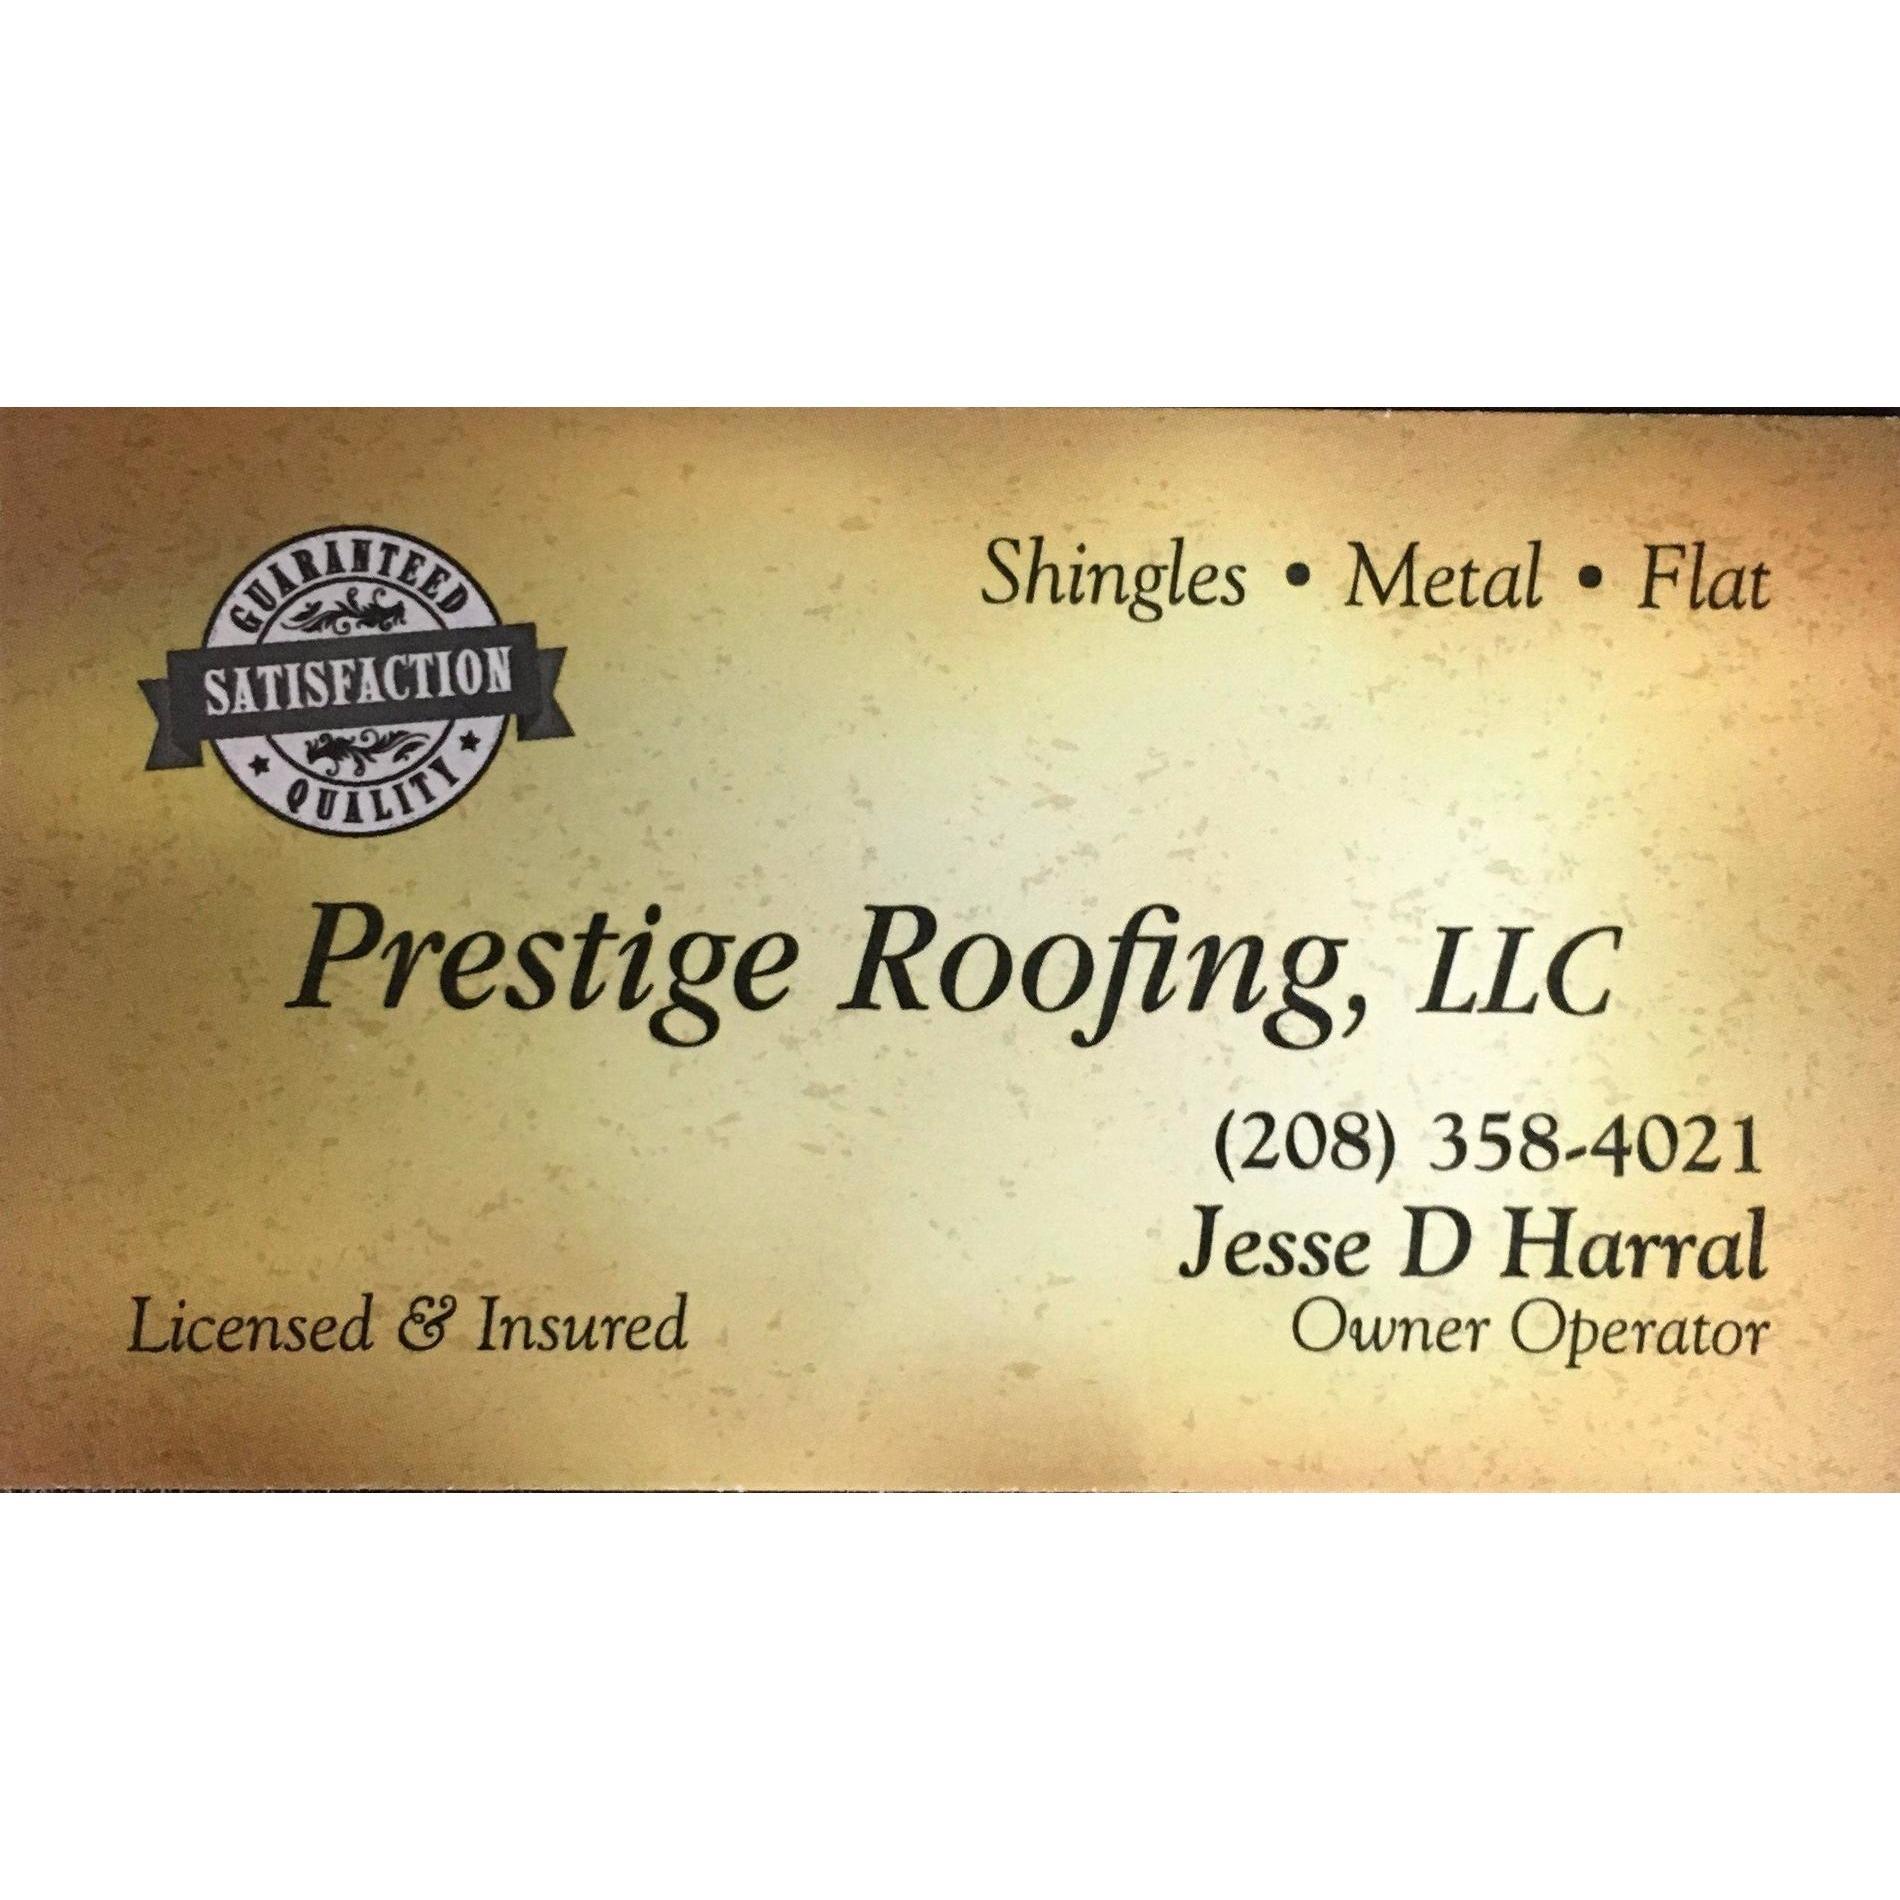 Prestige Roofing, LLC